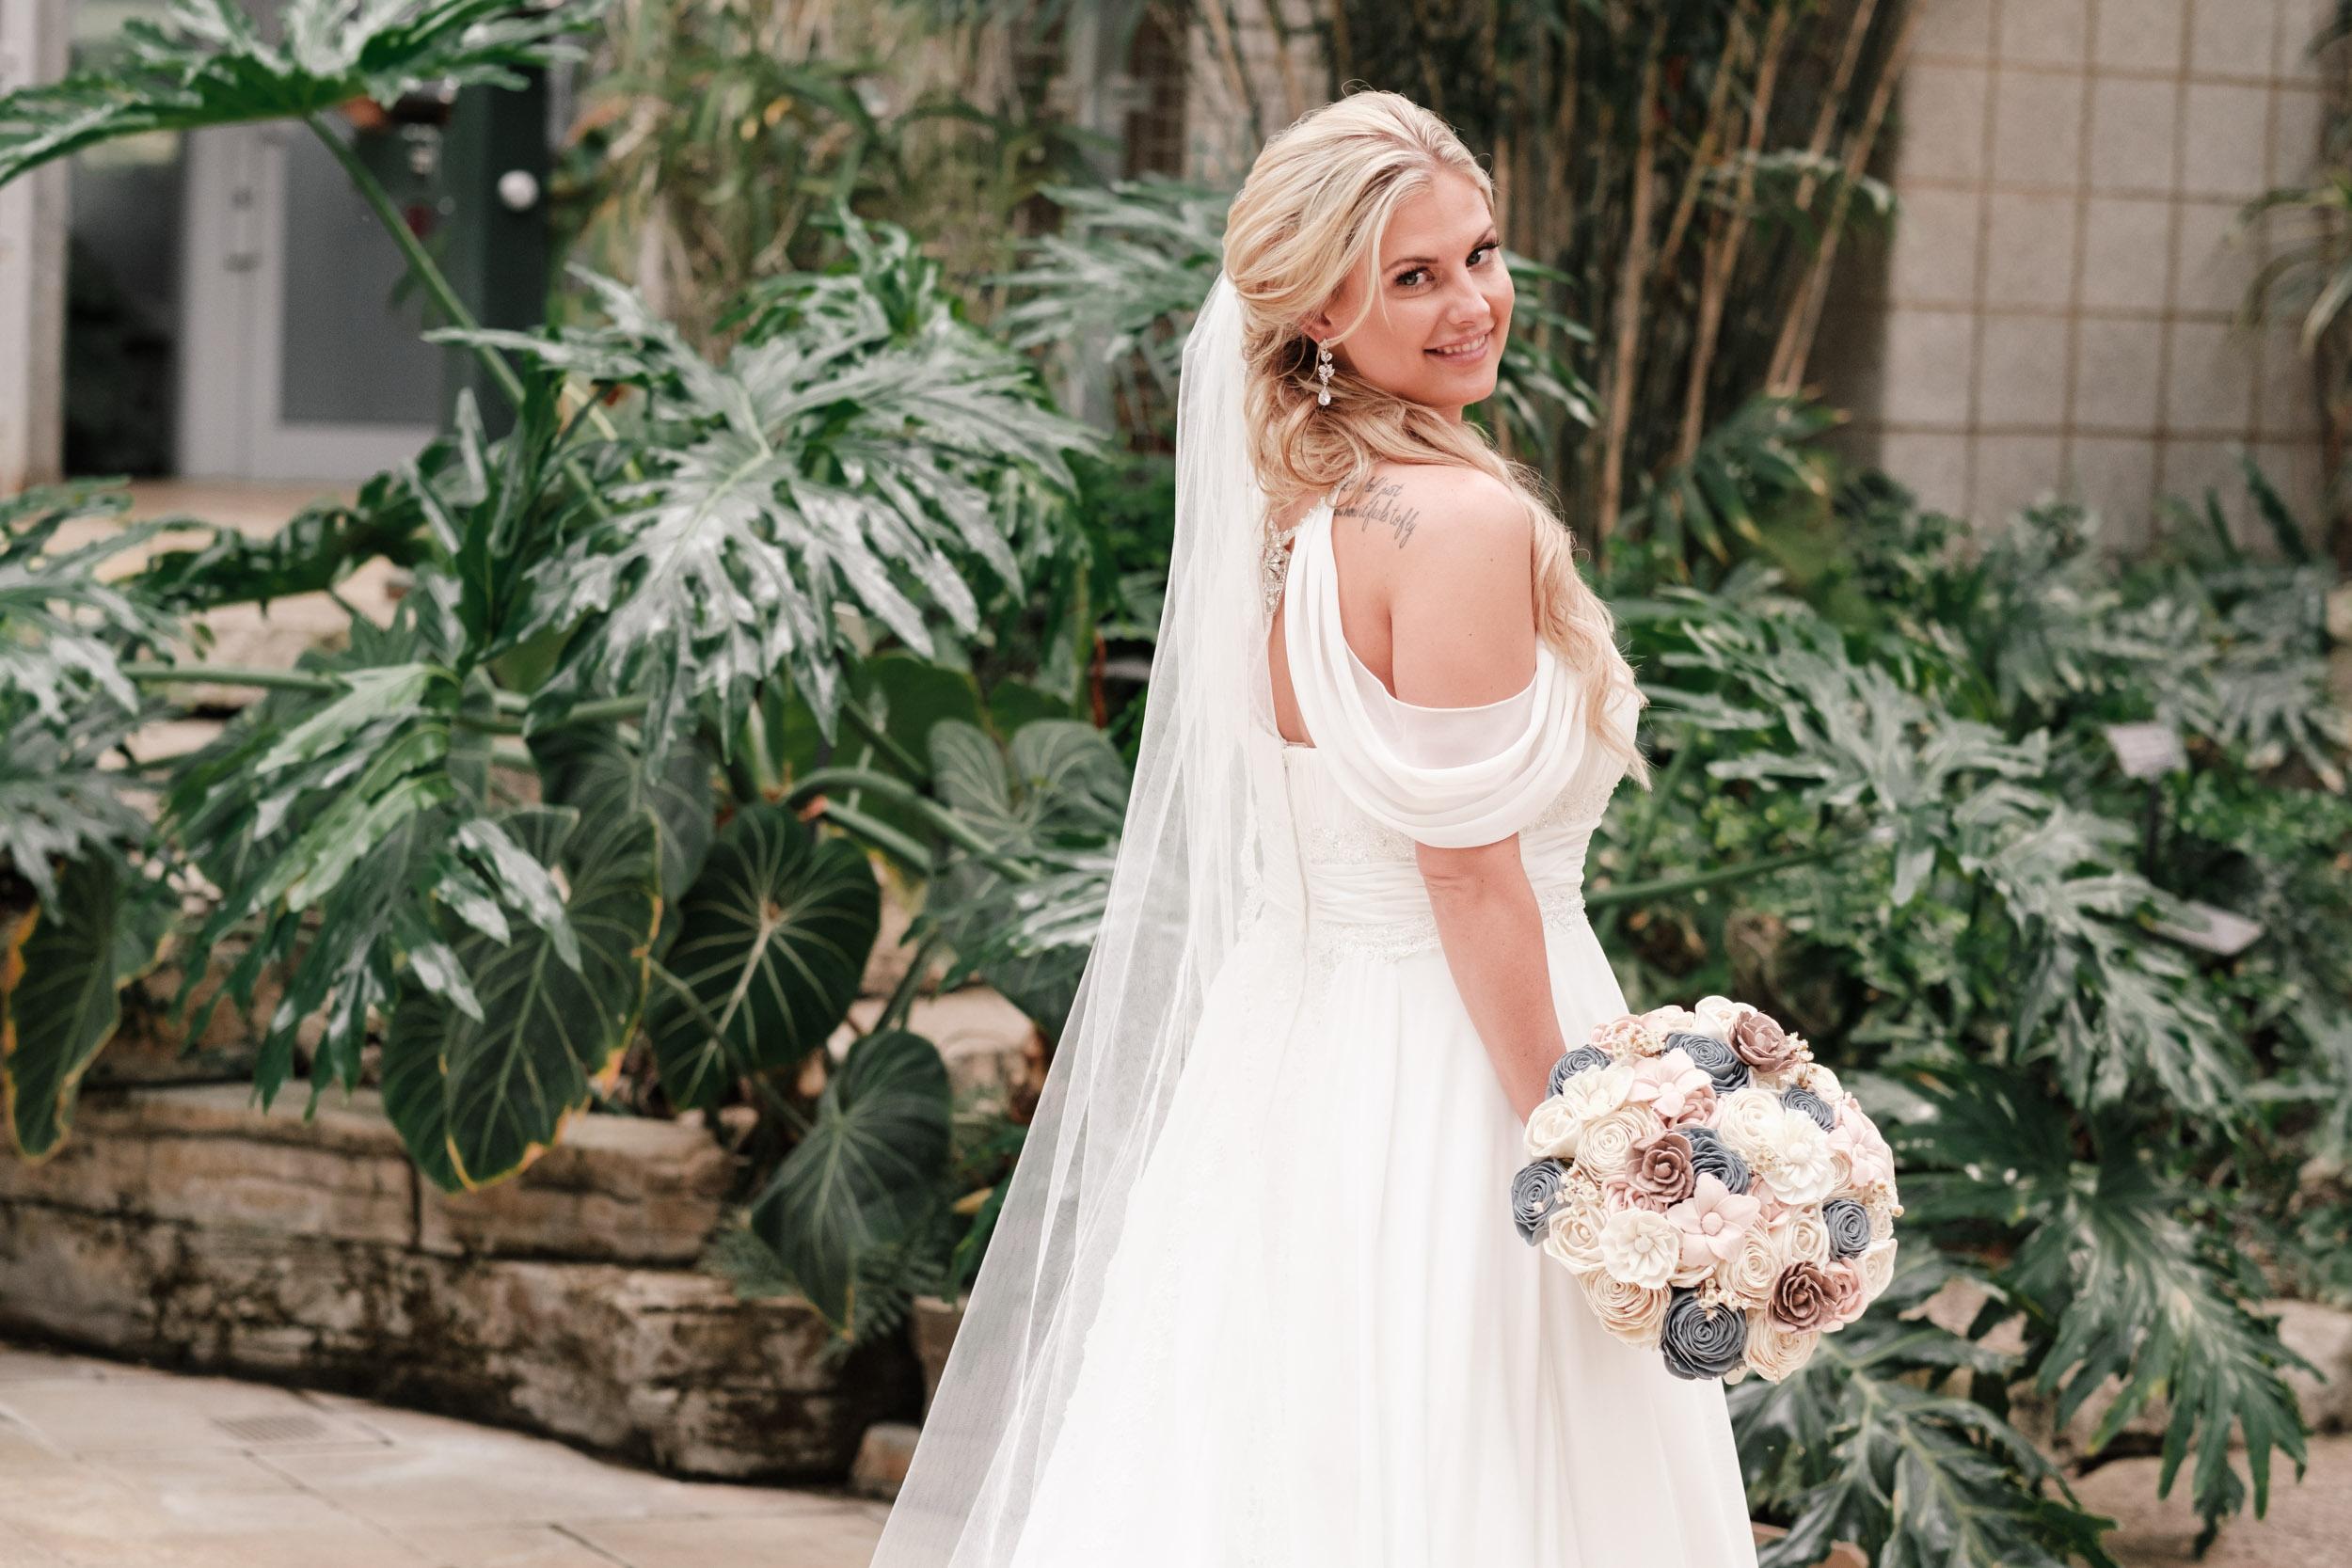 19-06-01 Megan Josh - Nicholas Conservatory Wedding-30.jpg